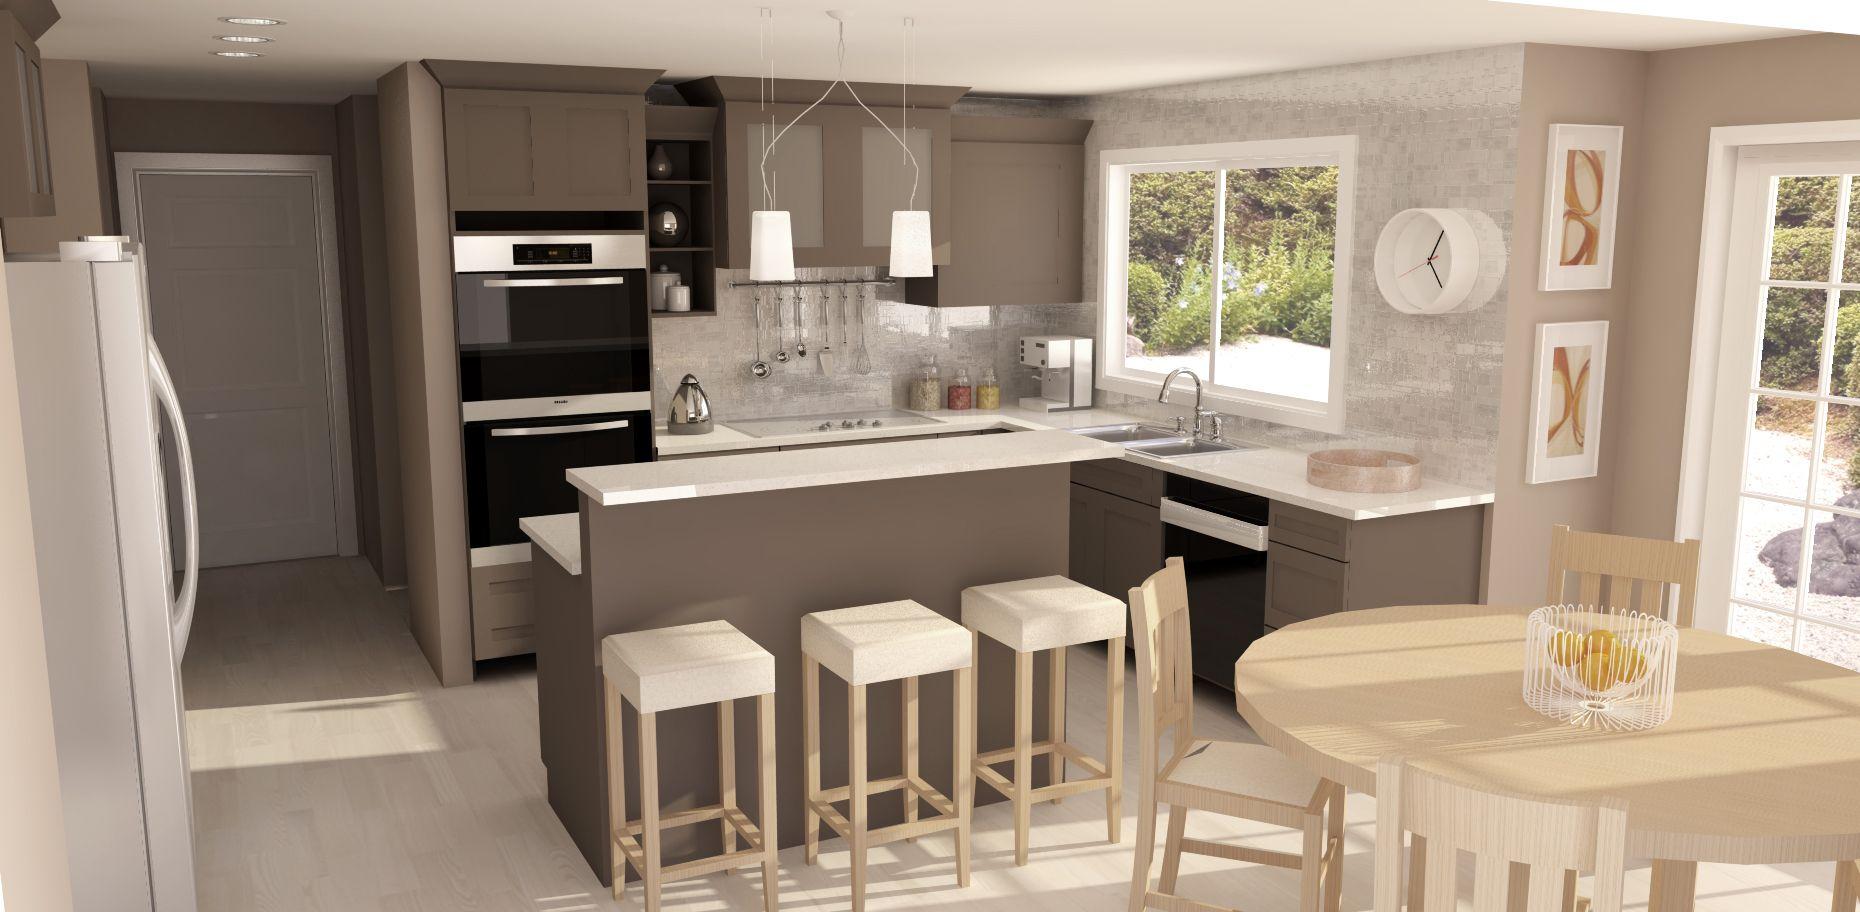 Top 10 Kitchen Cabinets 2016 Design Trends Granite Transformations Blog